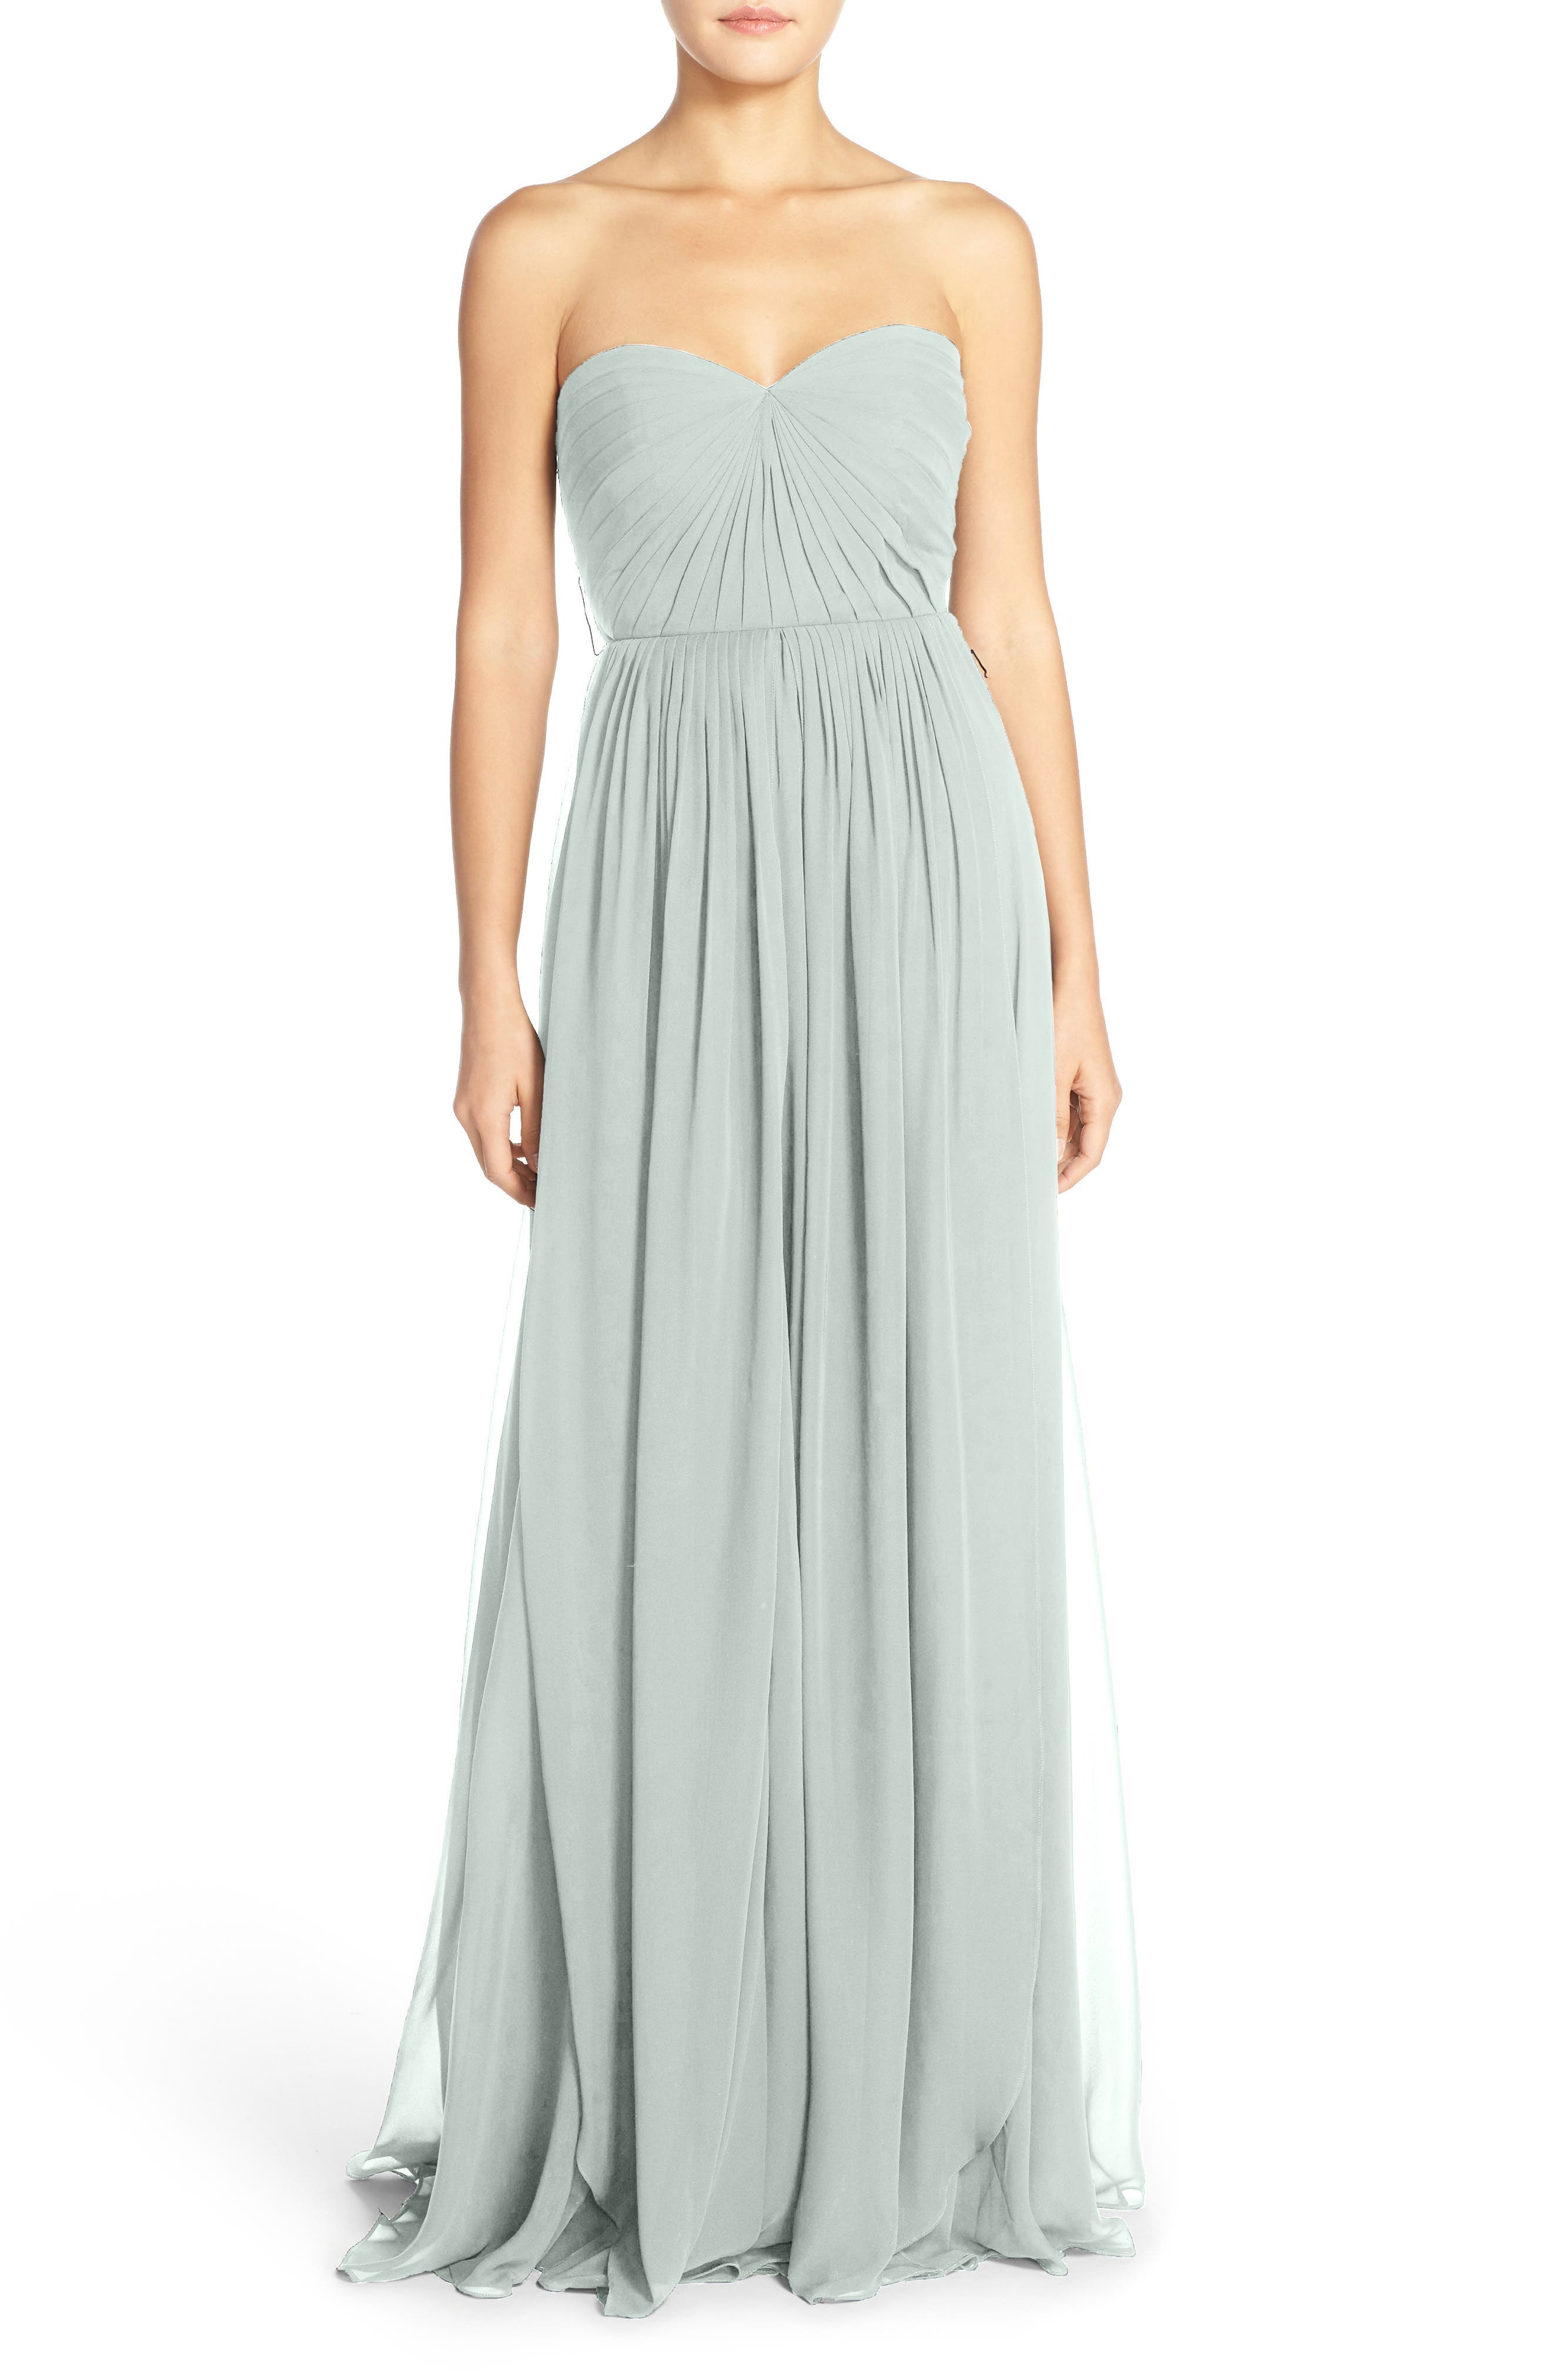 Mira Convertible Strapless Chiffon Gown,                             Main thumbnail 1, color,                             MORNING MIST